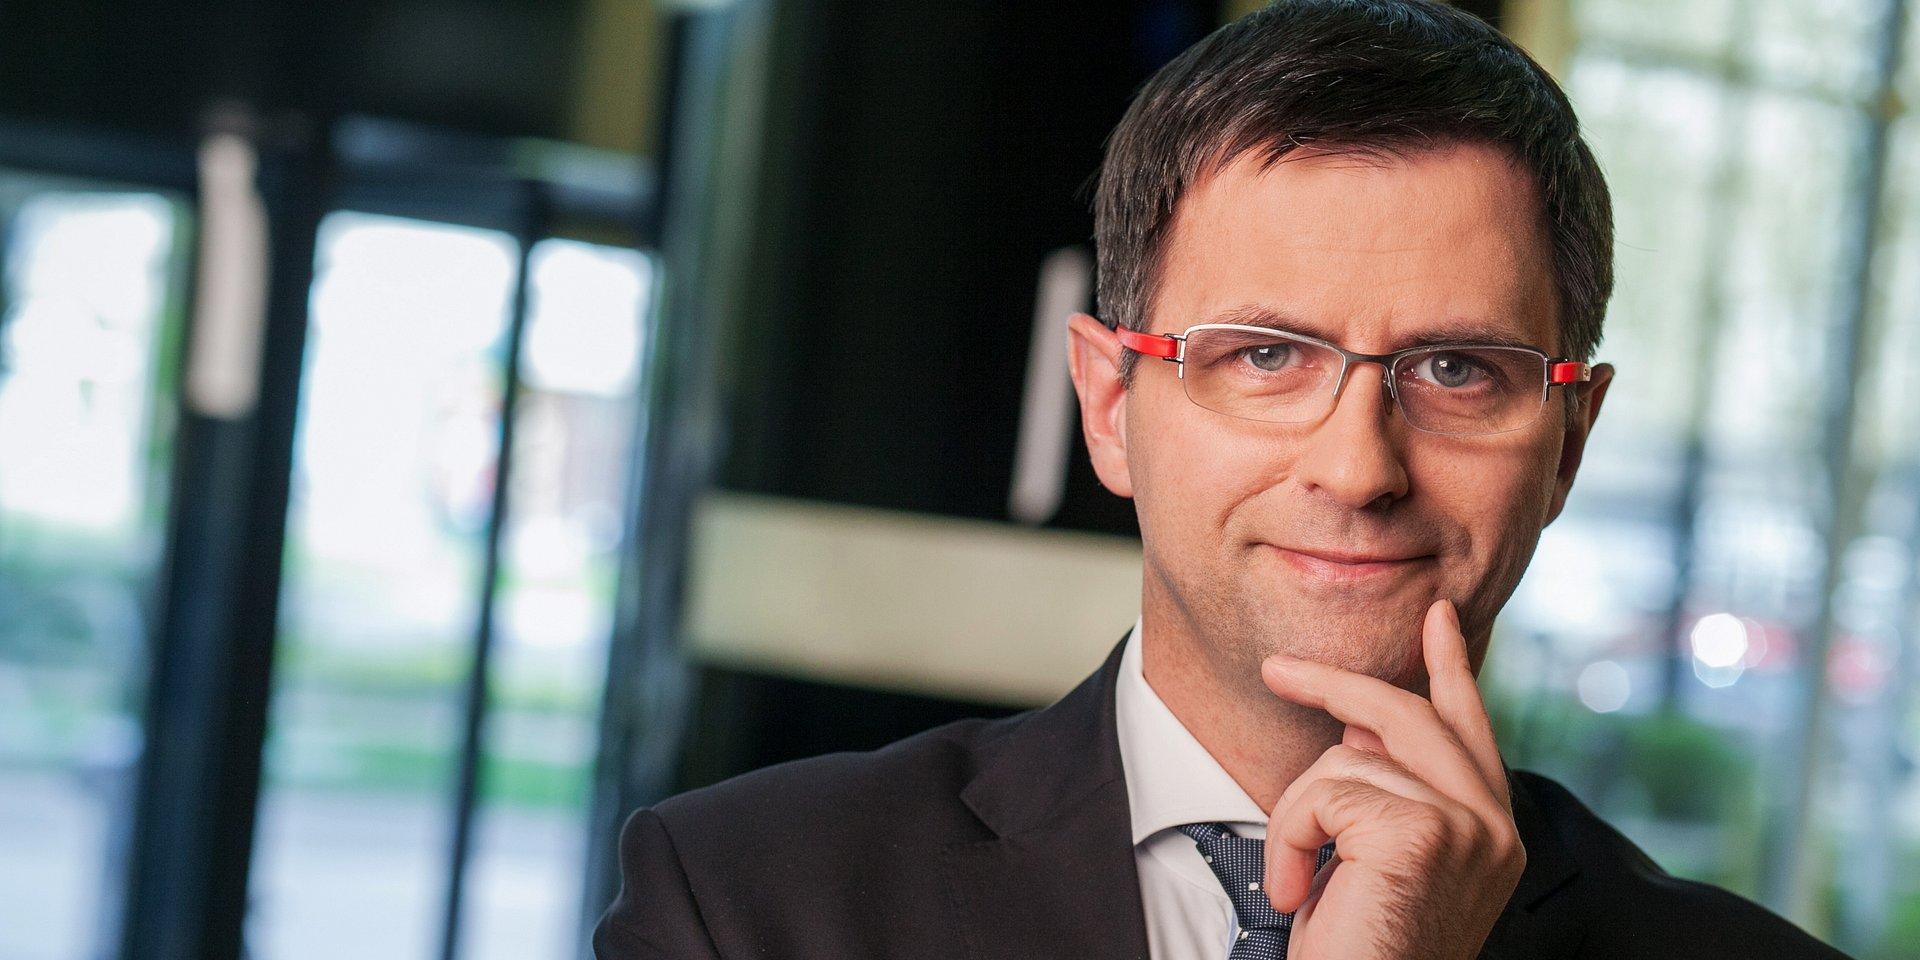 Mateusz Skubiszewski promoted